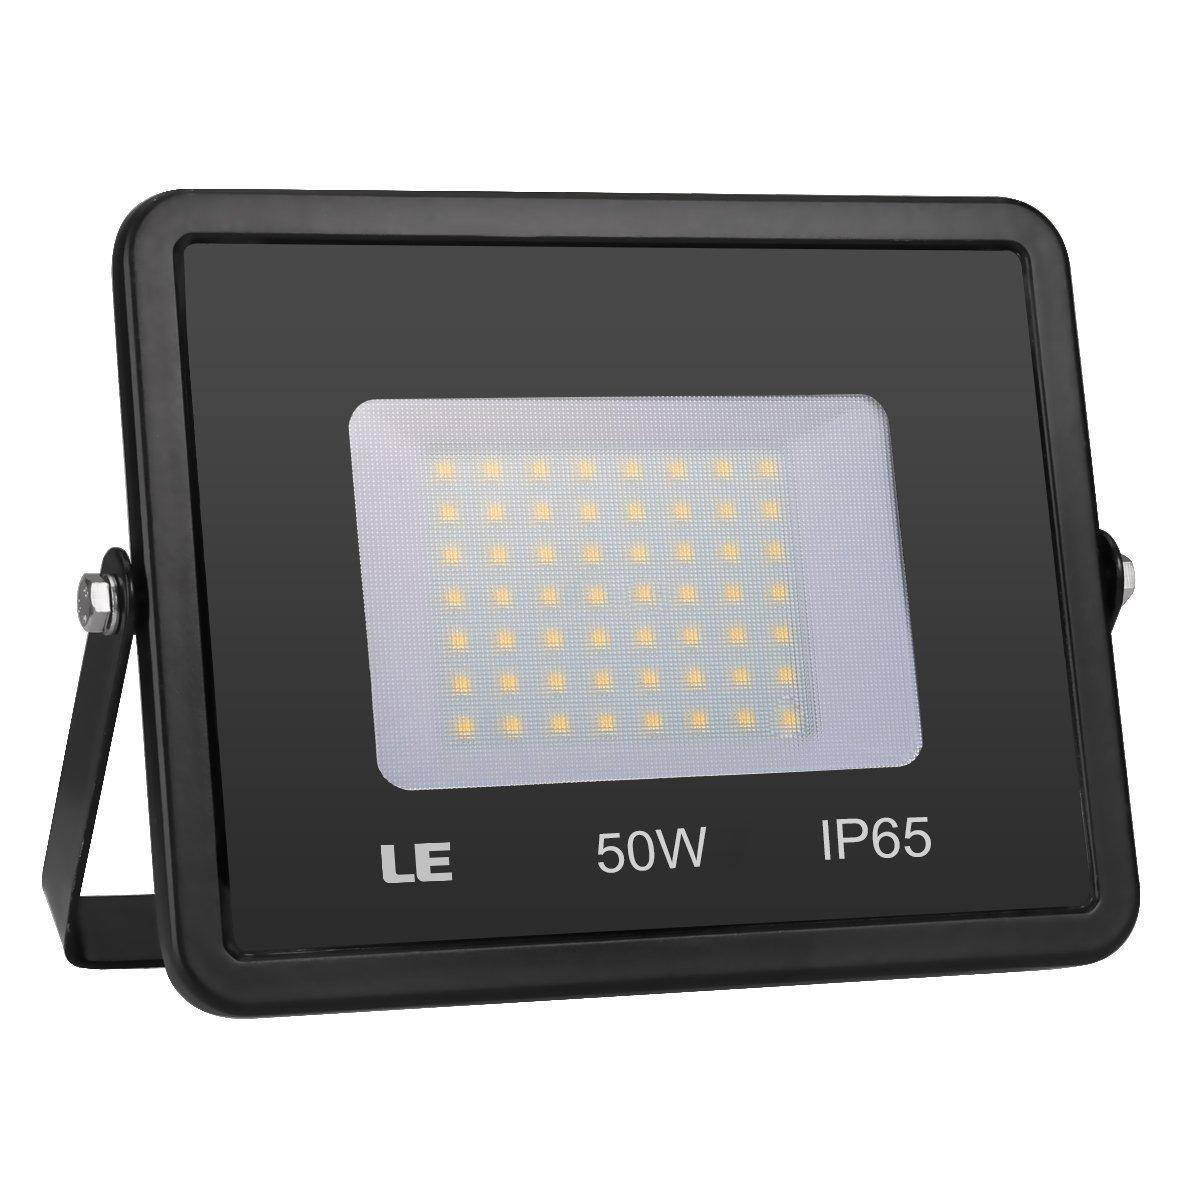 LE 50W Super Bright Outdoor LED Flood Lights, Waterproof, Security Lights, Floodlight (No Plug)